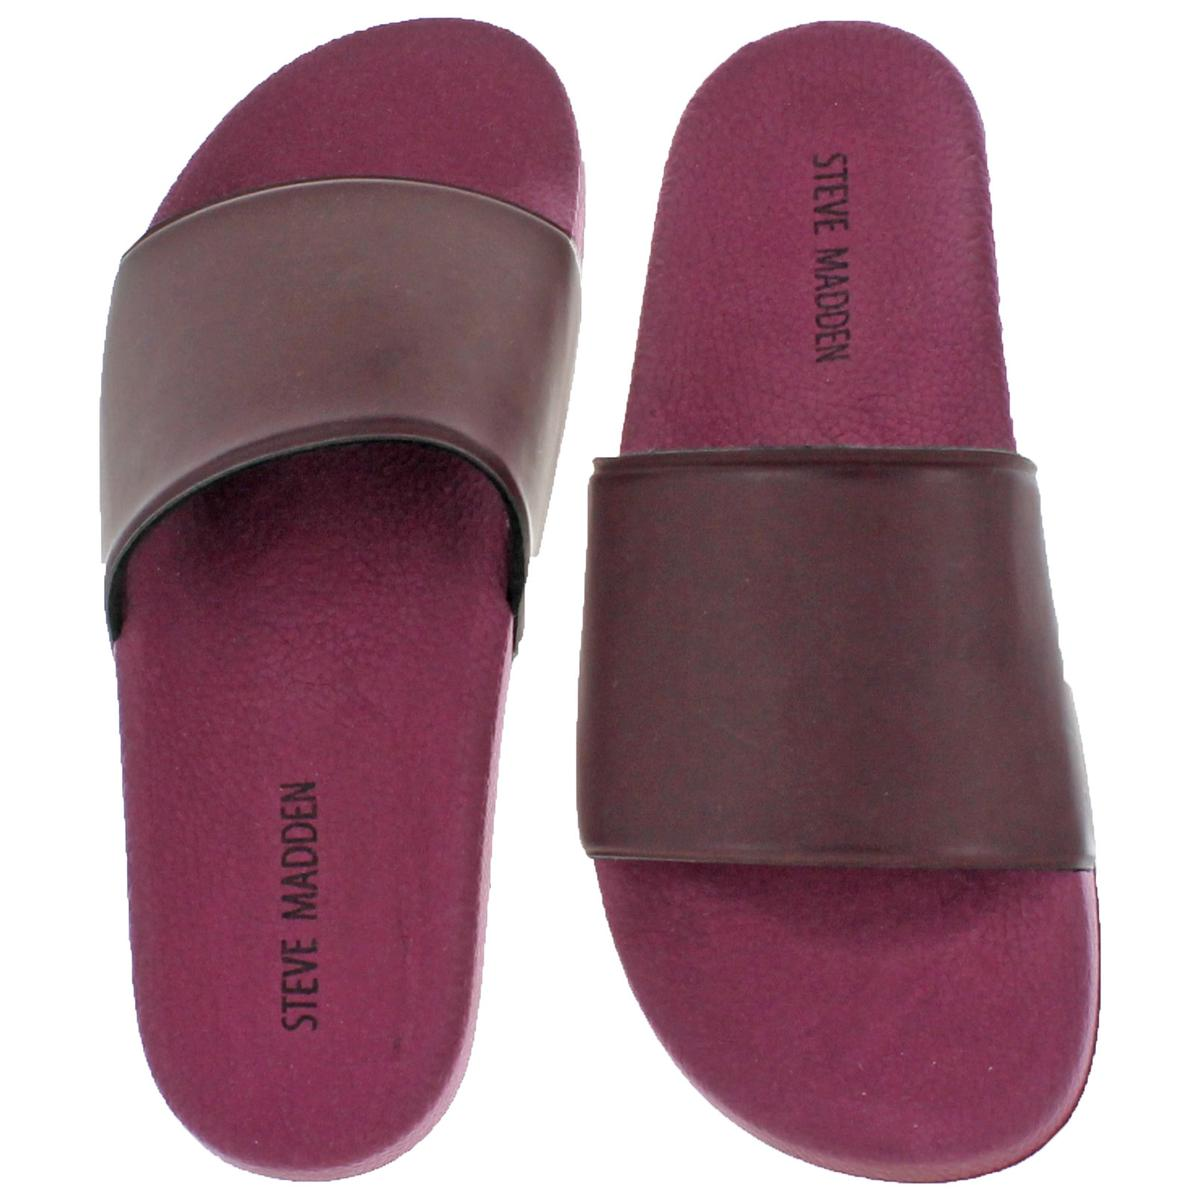 b7bfcaa3134 Steve Madden Mens Mastic Purple Slide Sport Sandals Shoes 8 Medium (d) BHFO  3338